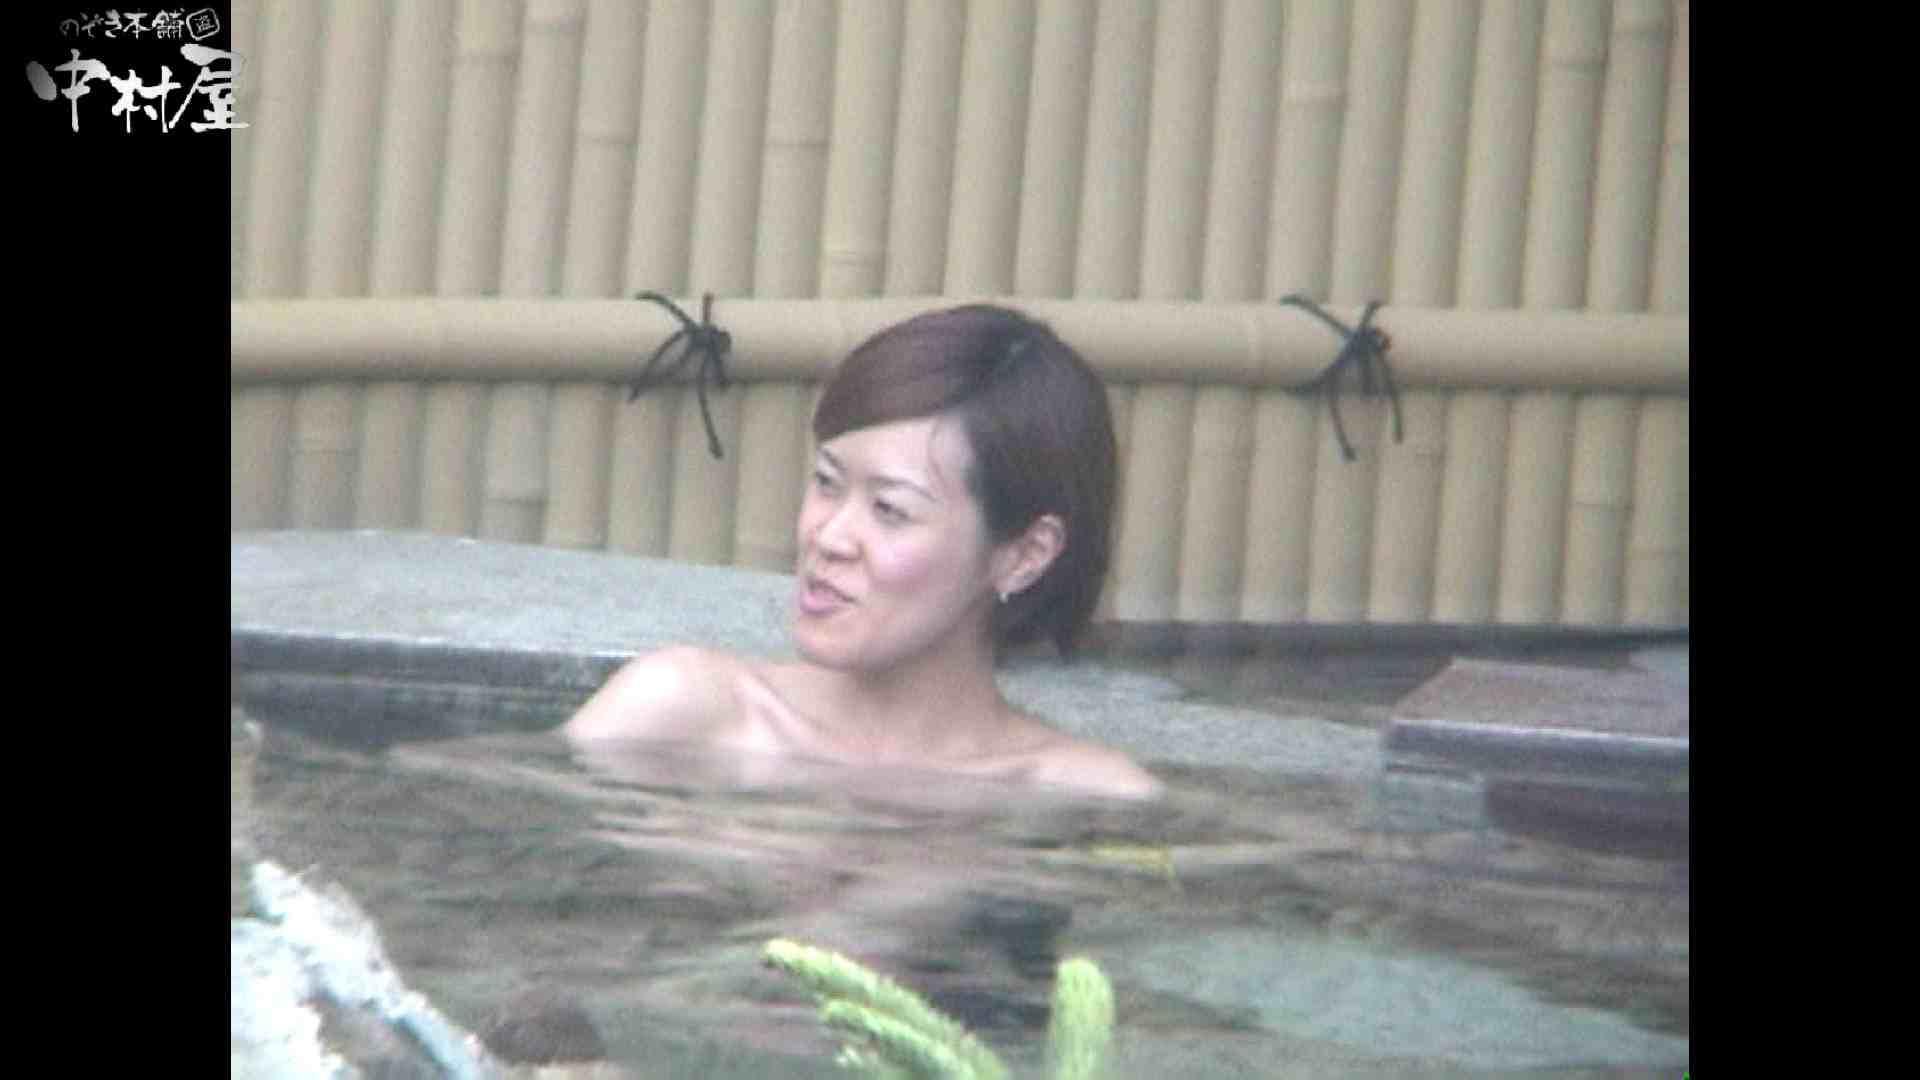 Aquaな露天風呂Vol.961 OL女体  65連発 27